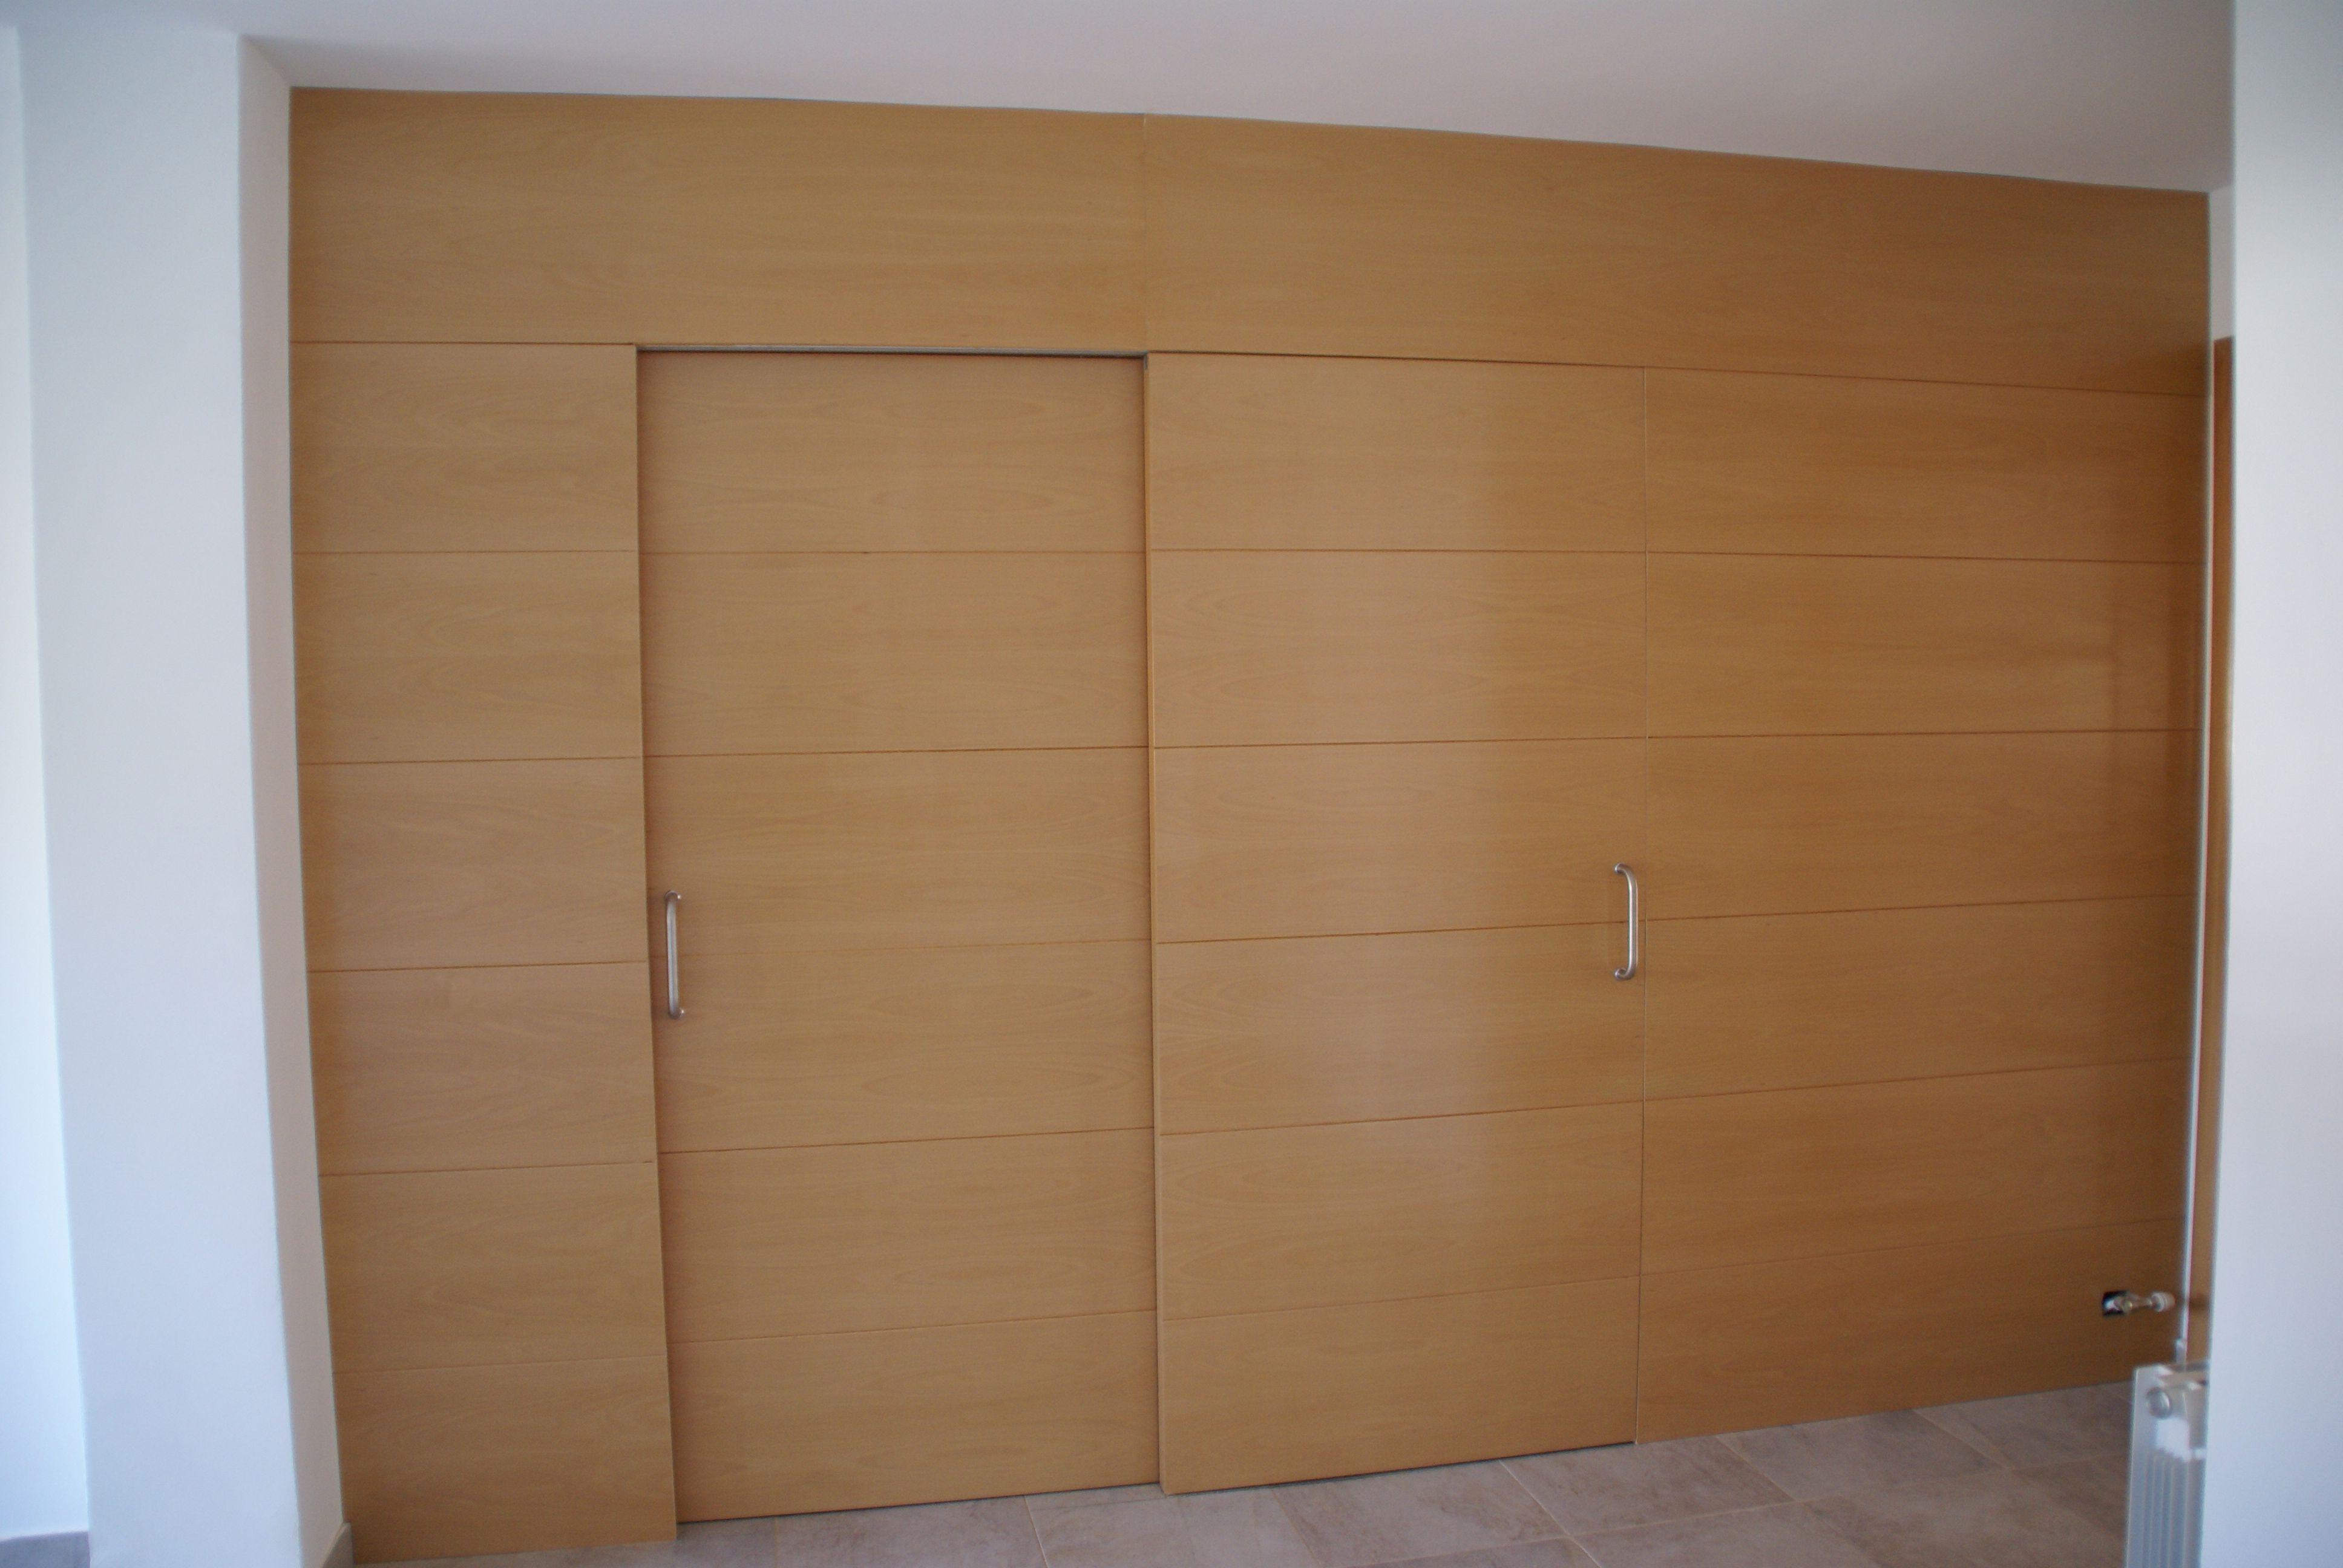 Corredera de doble hoja con panelado de pared a juego - Panelados para paredes ...